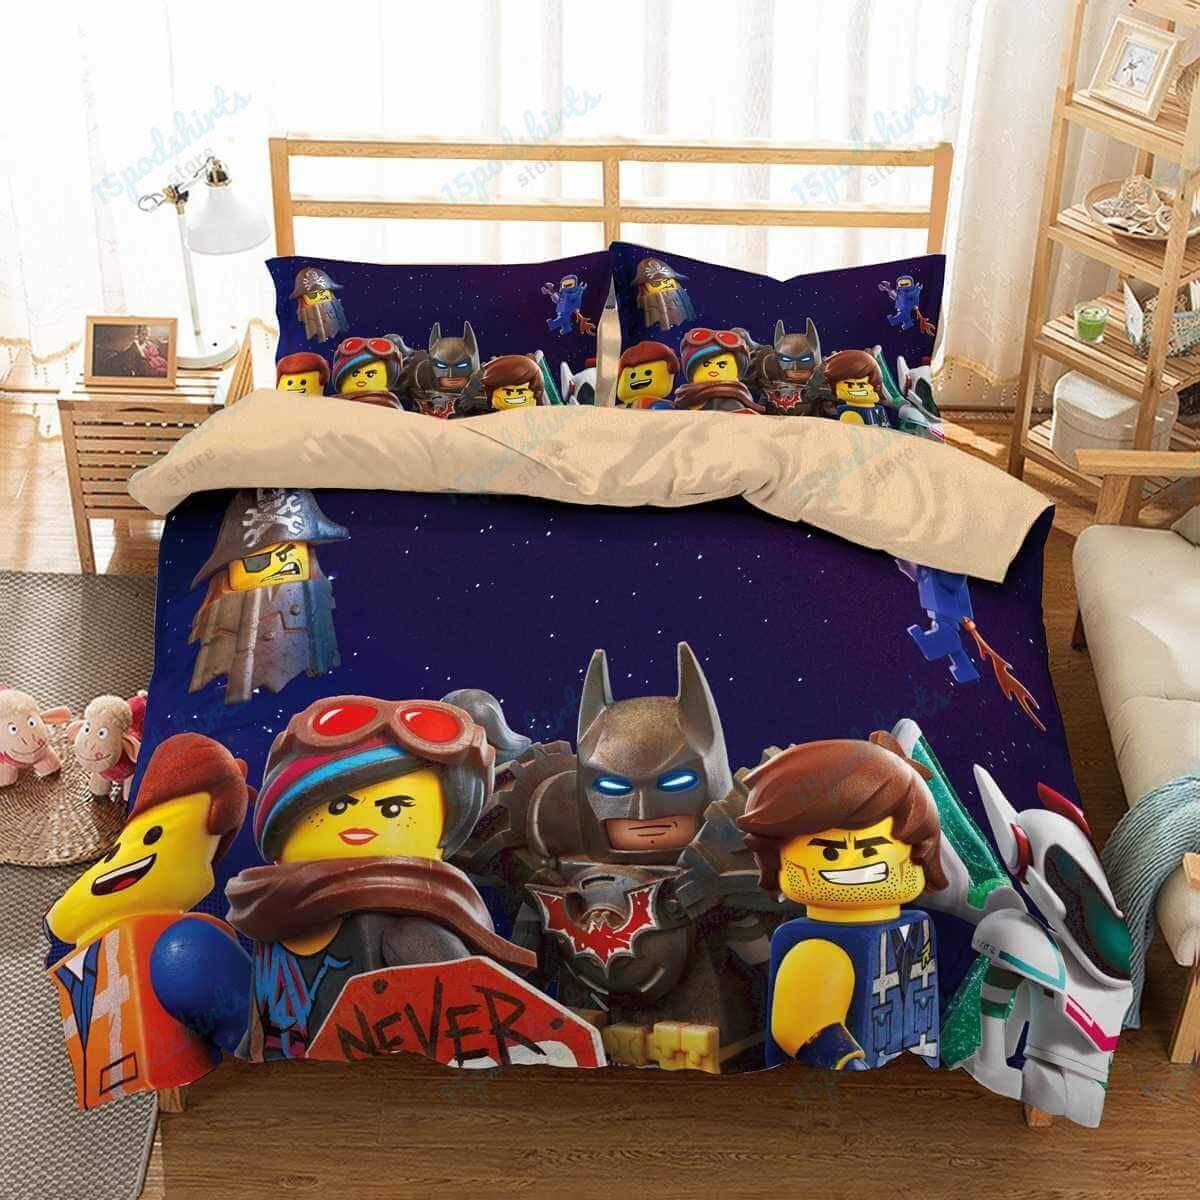 The Lego Movie 2 1 Duvet Cover Bedding Set